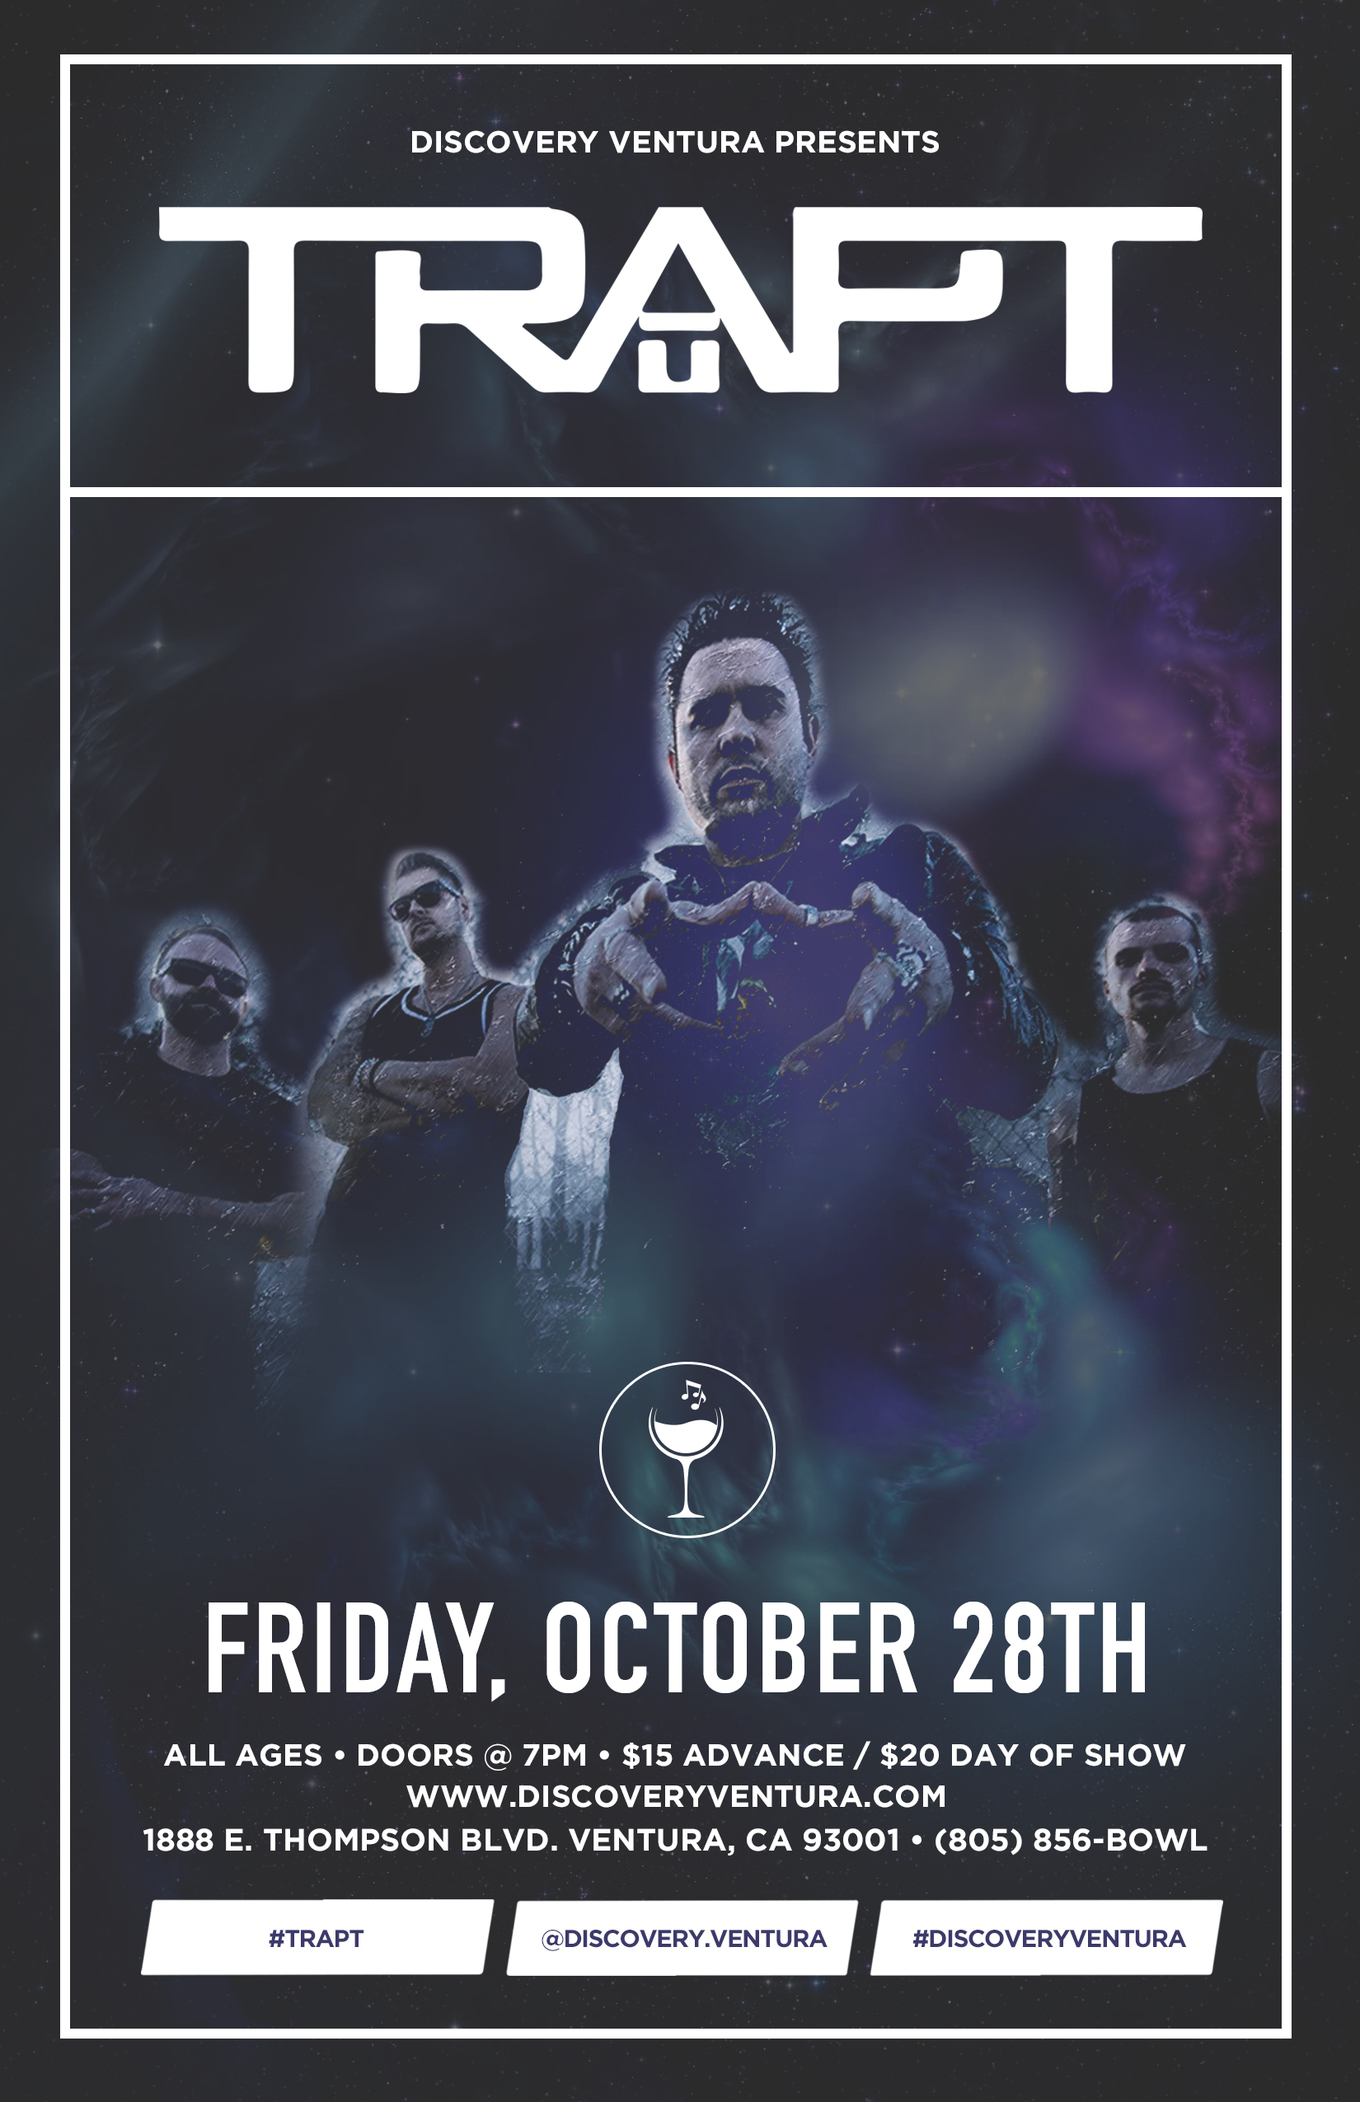 Trapt - Tickets - Discovery Ventura, Ventura, CA - October 28, 2016